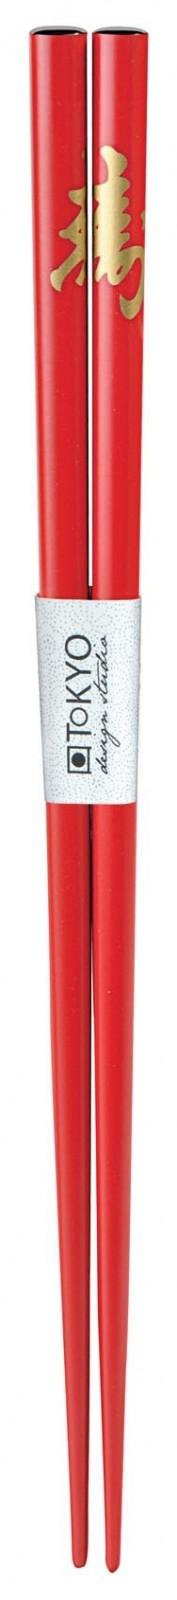 Chopstick Kotobuki Red - 23 cm